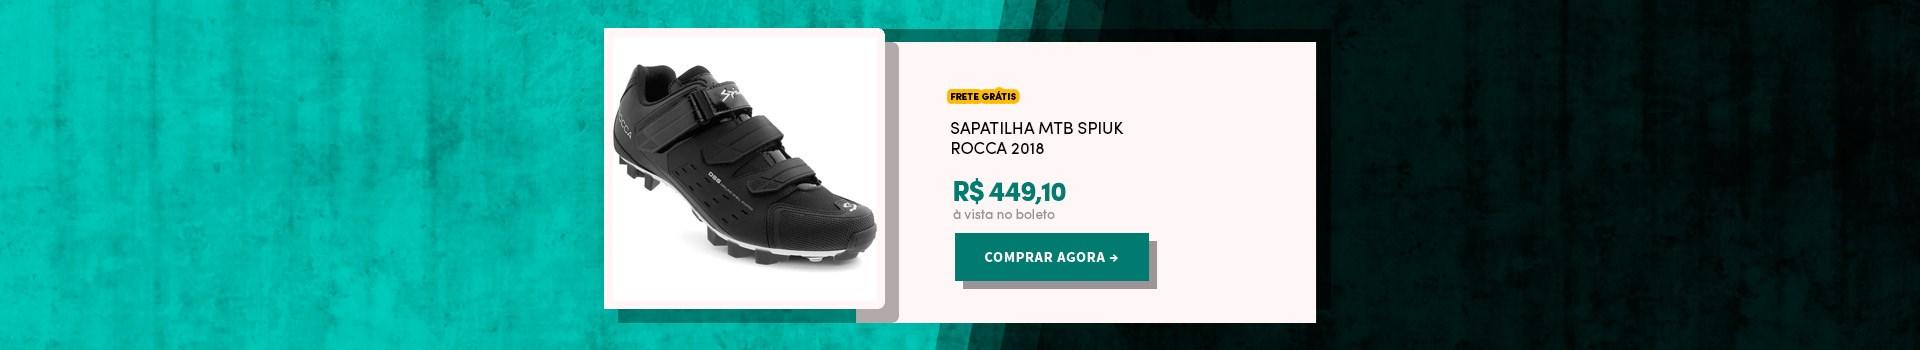 Sapatilha MTB Spiuk Rocca 2018